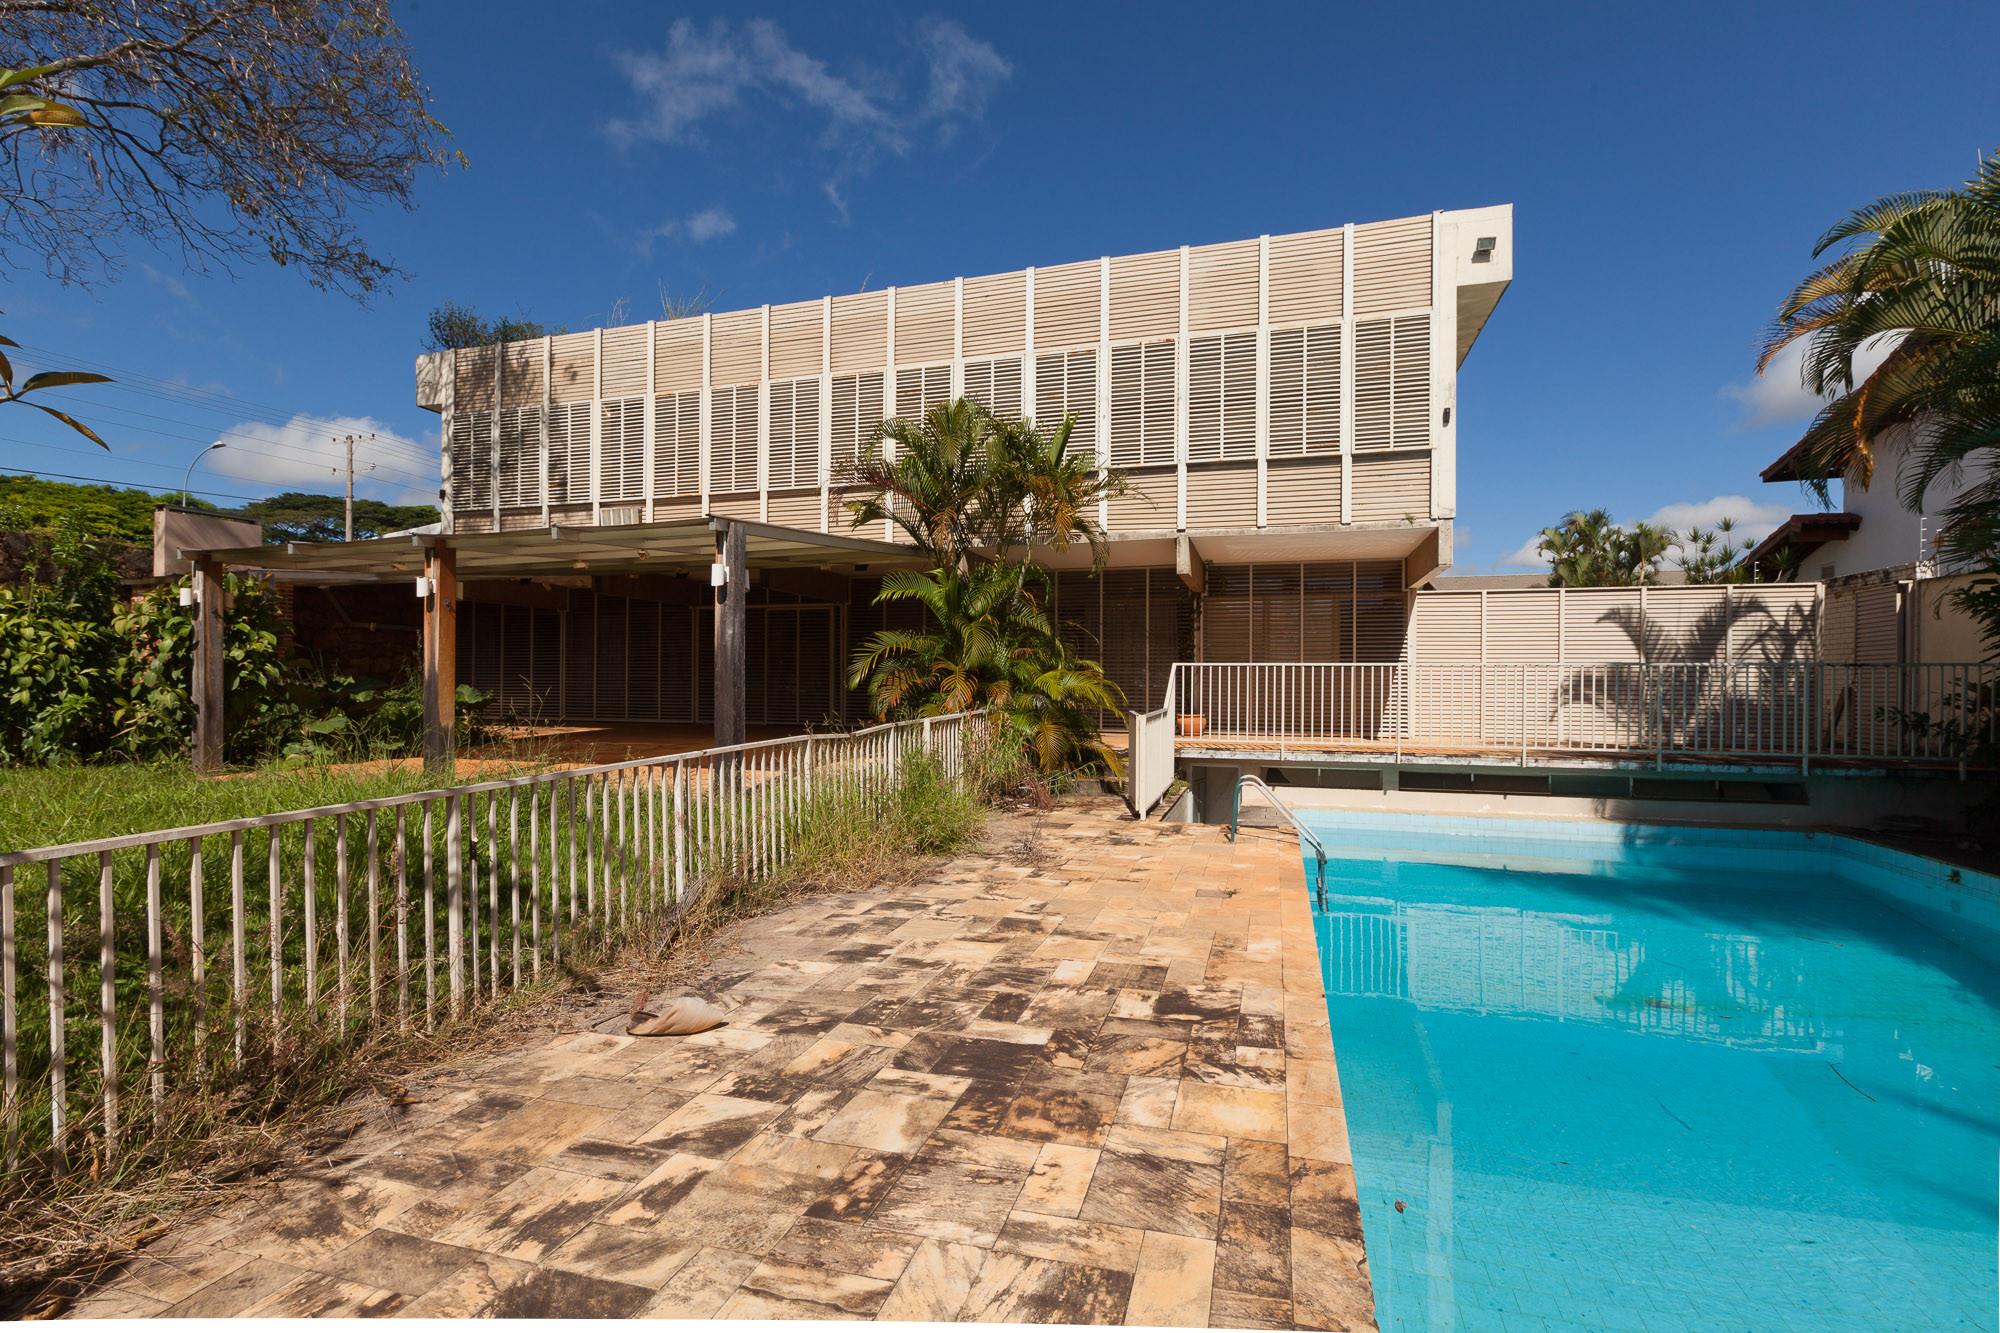 Residencia Atual de la embajada de África del Sur © Joana França